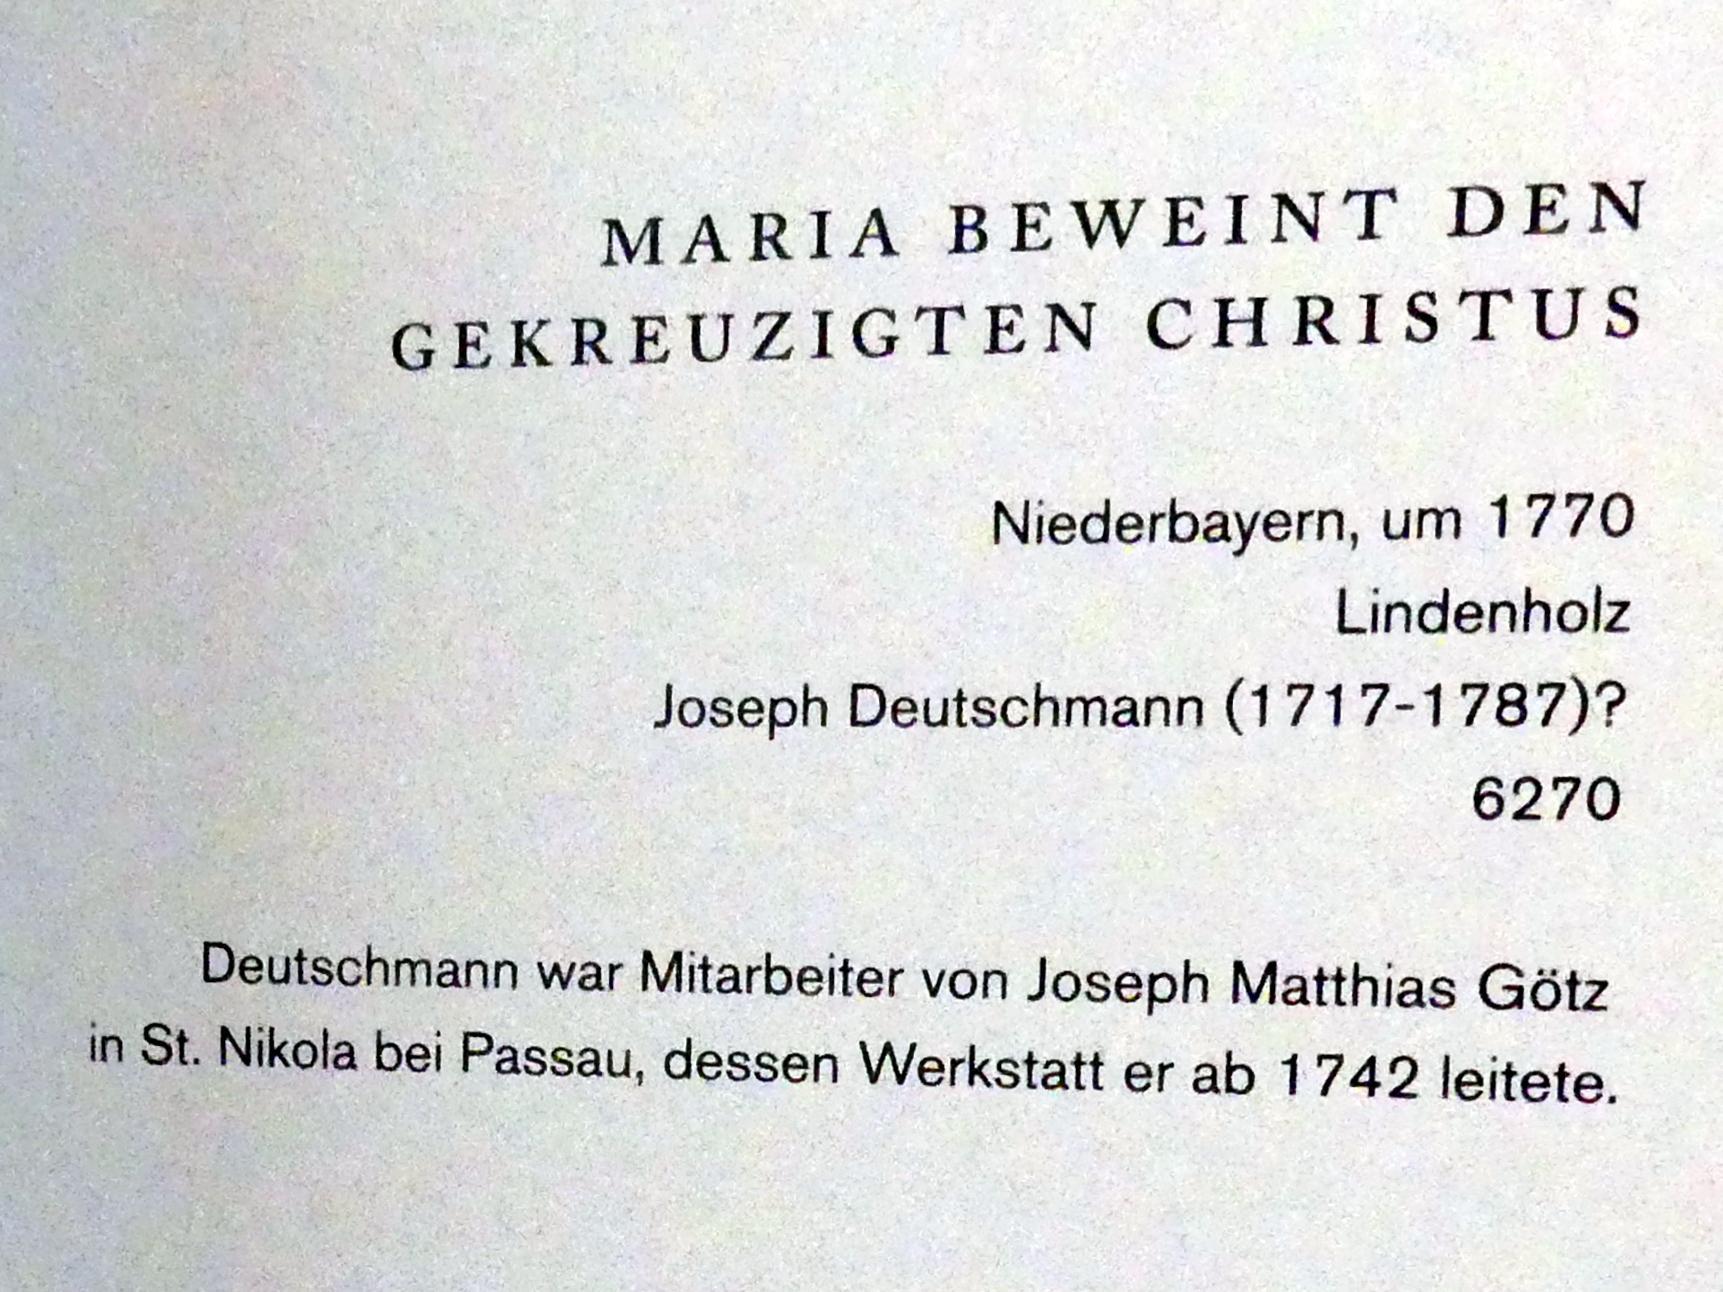 Joseph Deutschmann: Maria beweint den gekreuzigten Christus, Um 1770